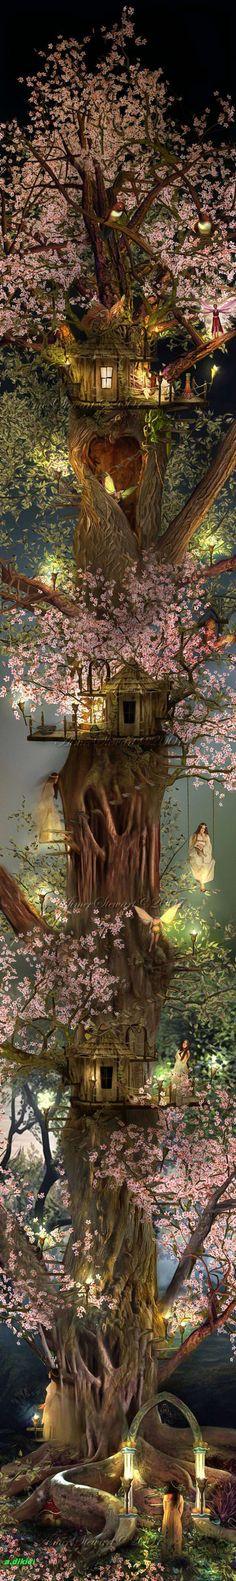 Fairy Dream House from THE ART OF AIMEE STEWART